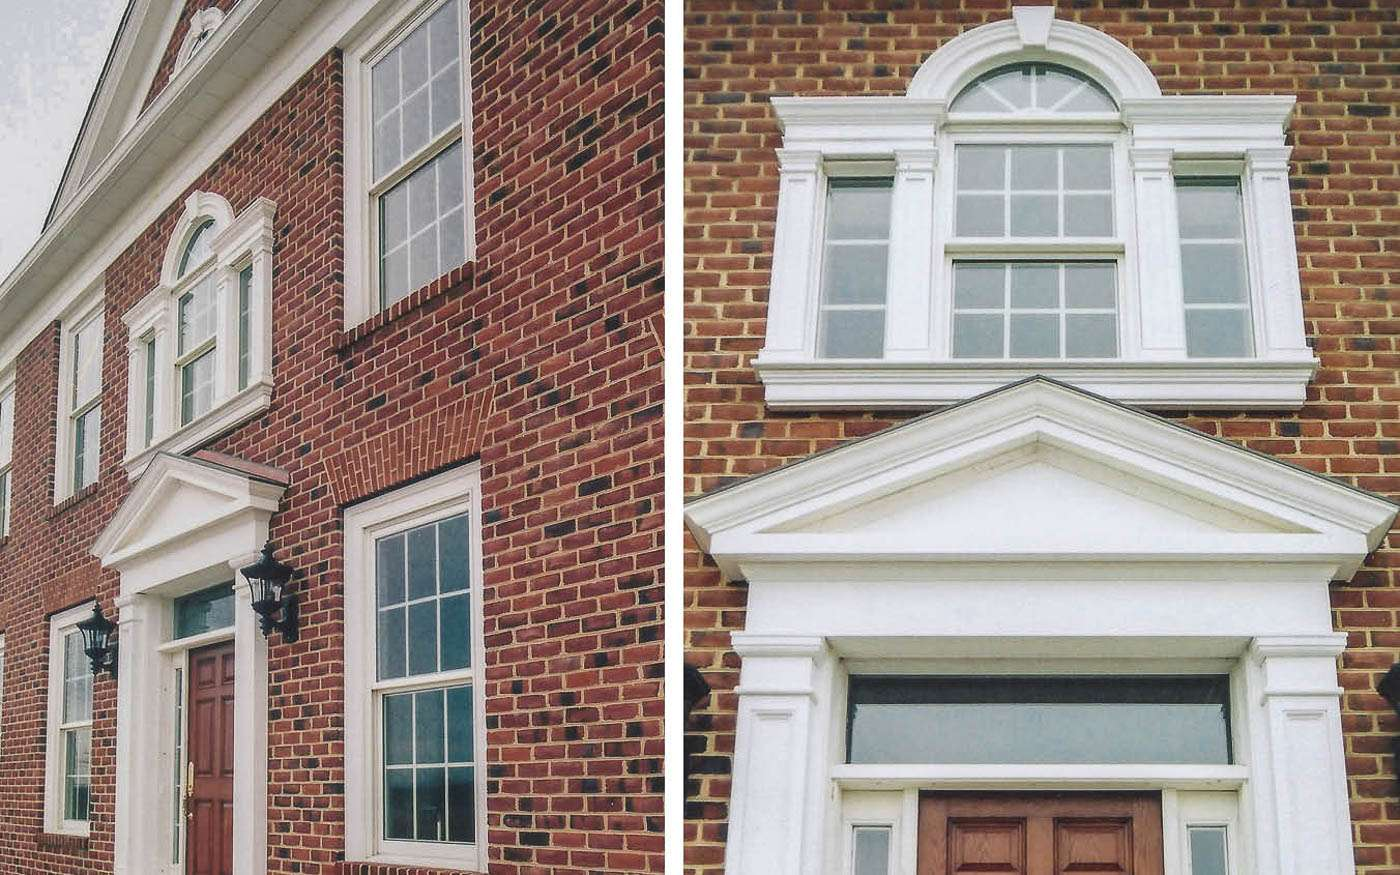 Engle Switch Residence Entrance 1 & 2